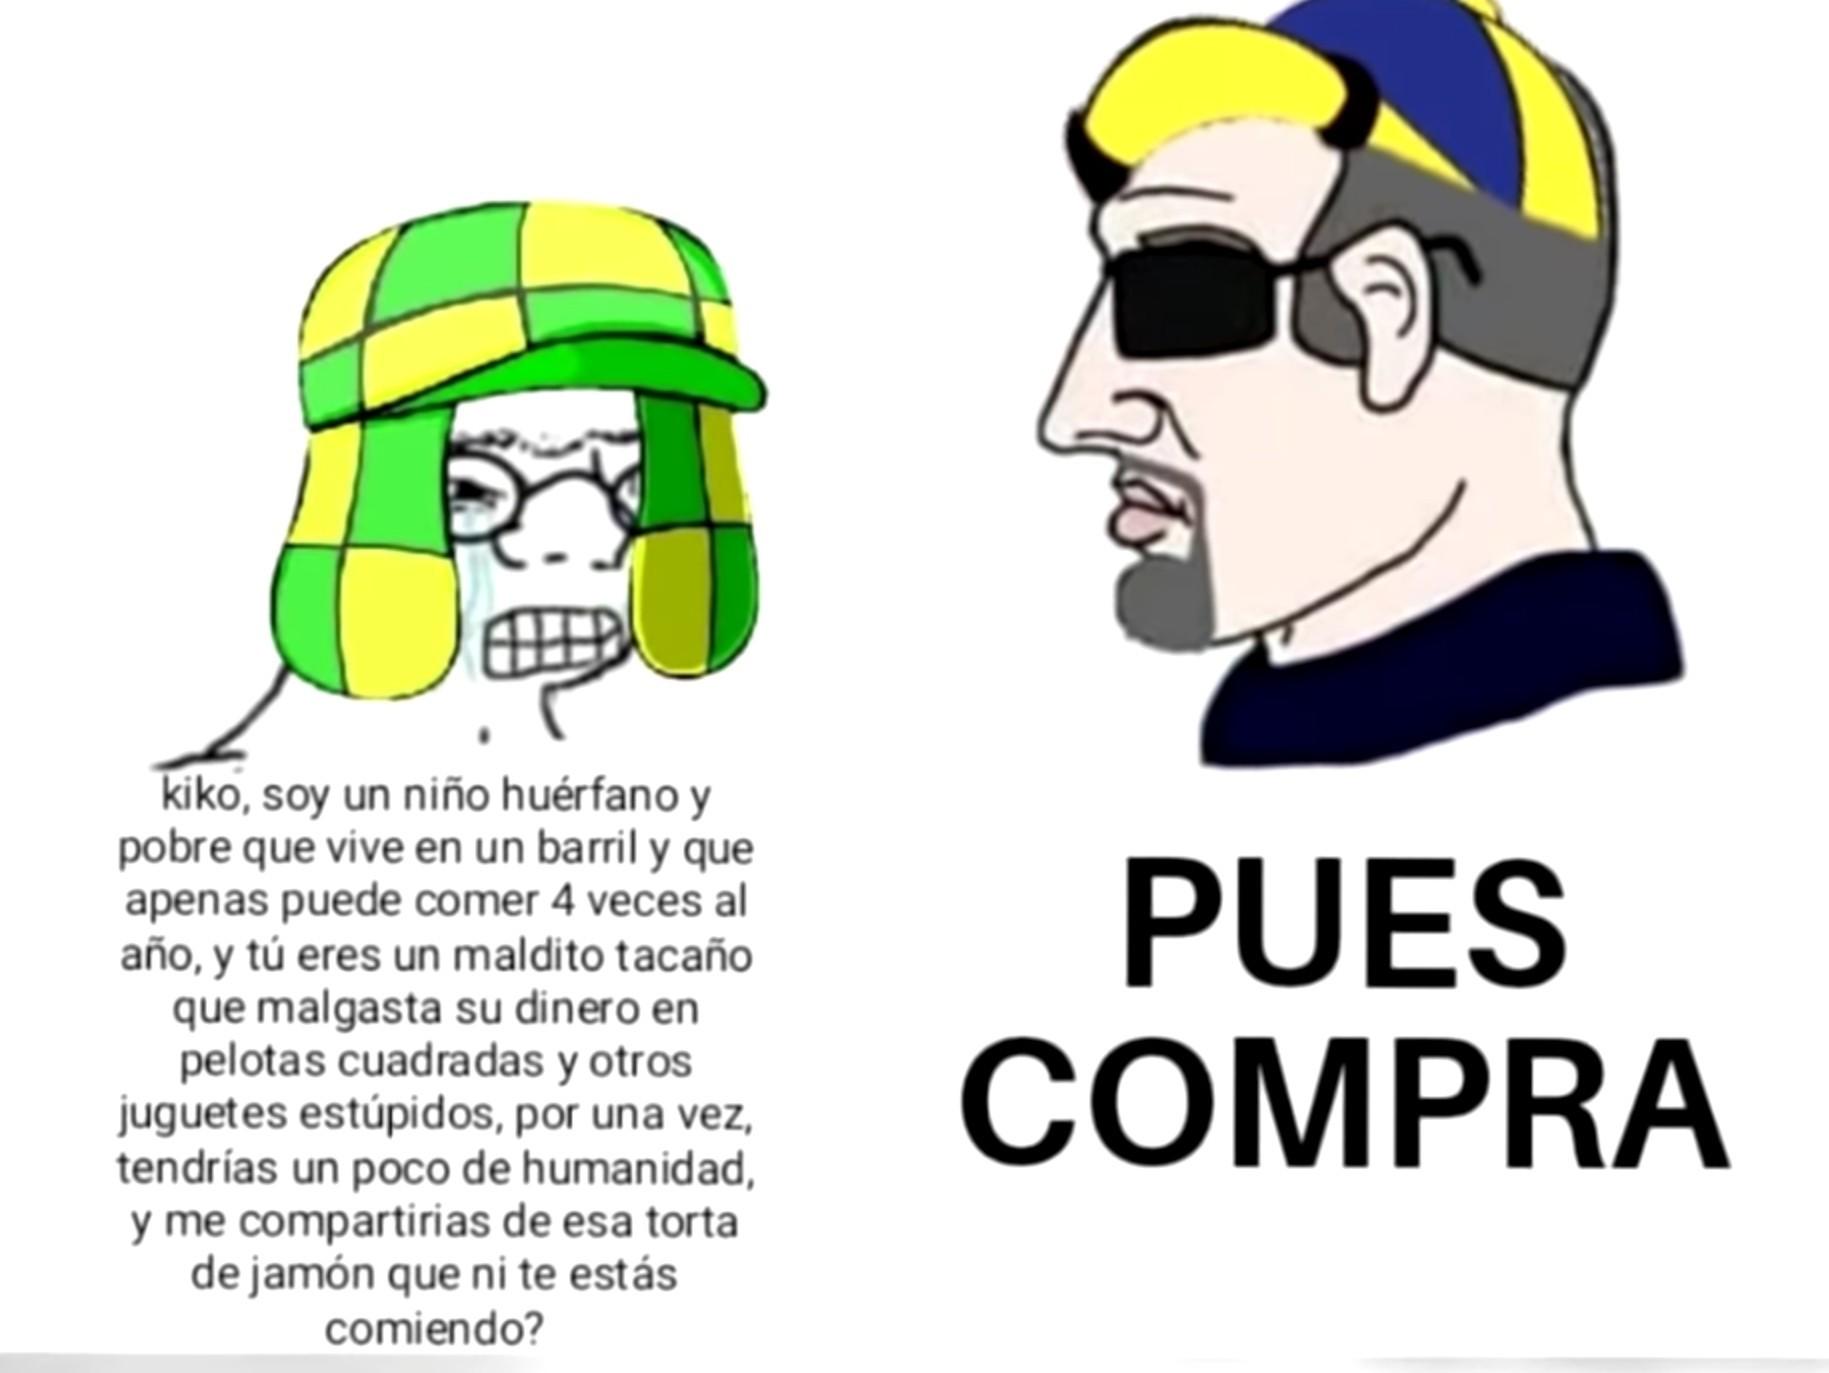 PUES COMPRA  - meme